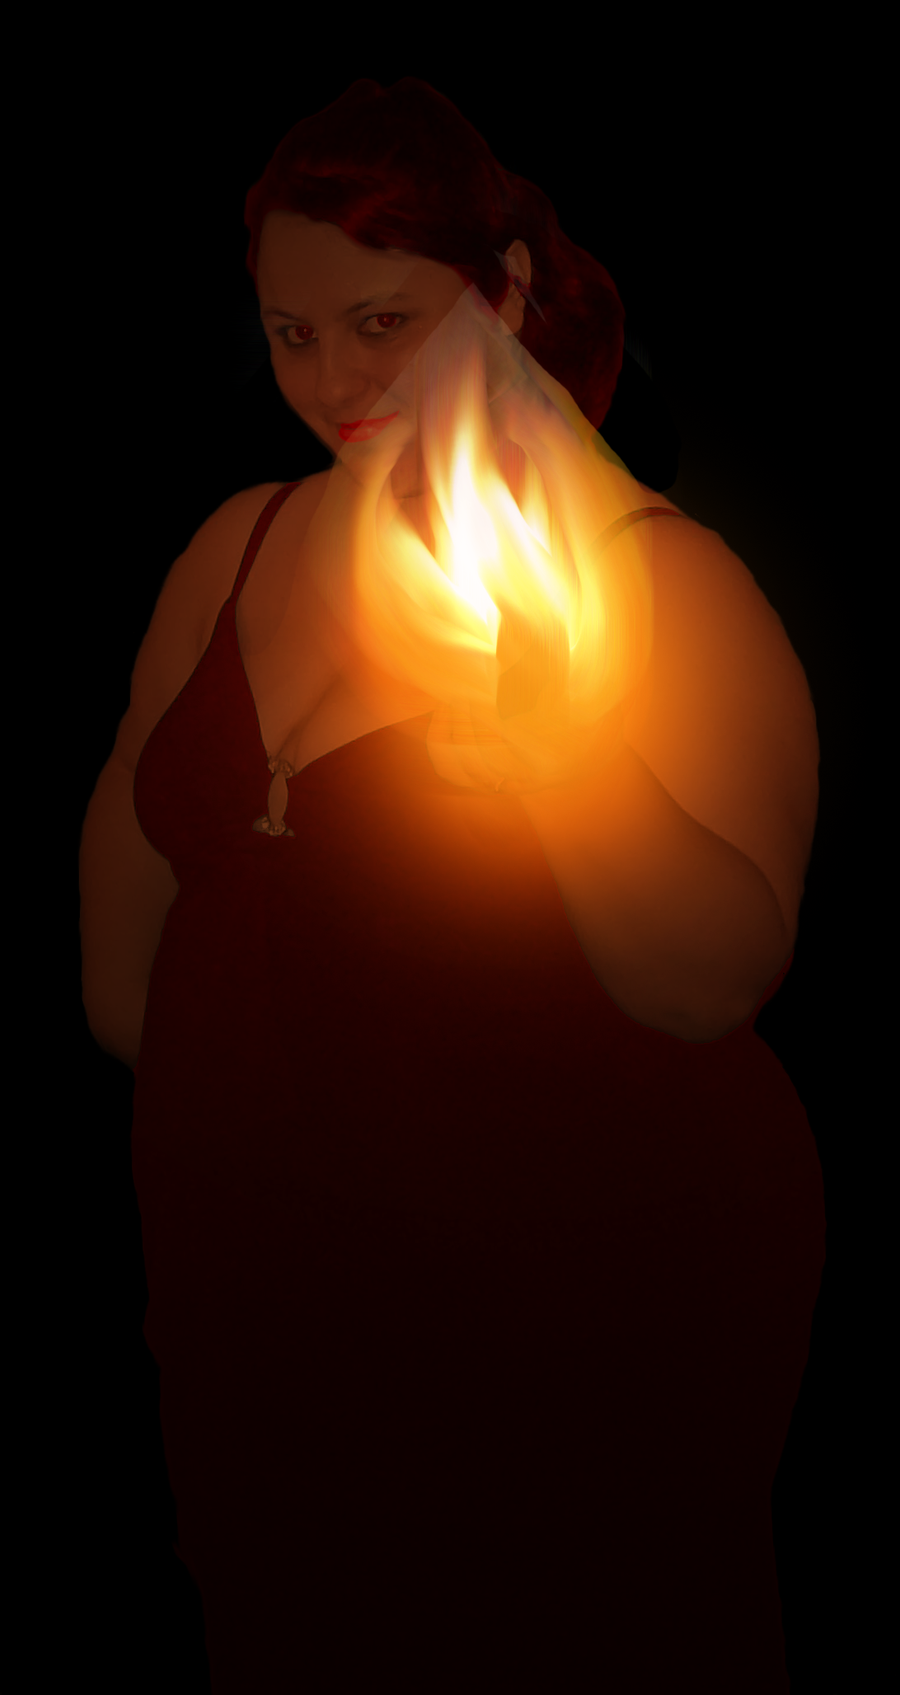 Flame Bbw 99